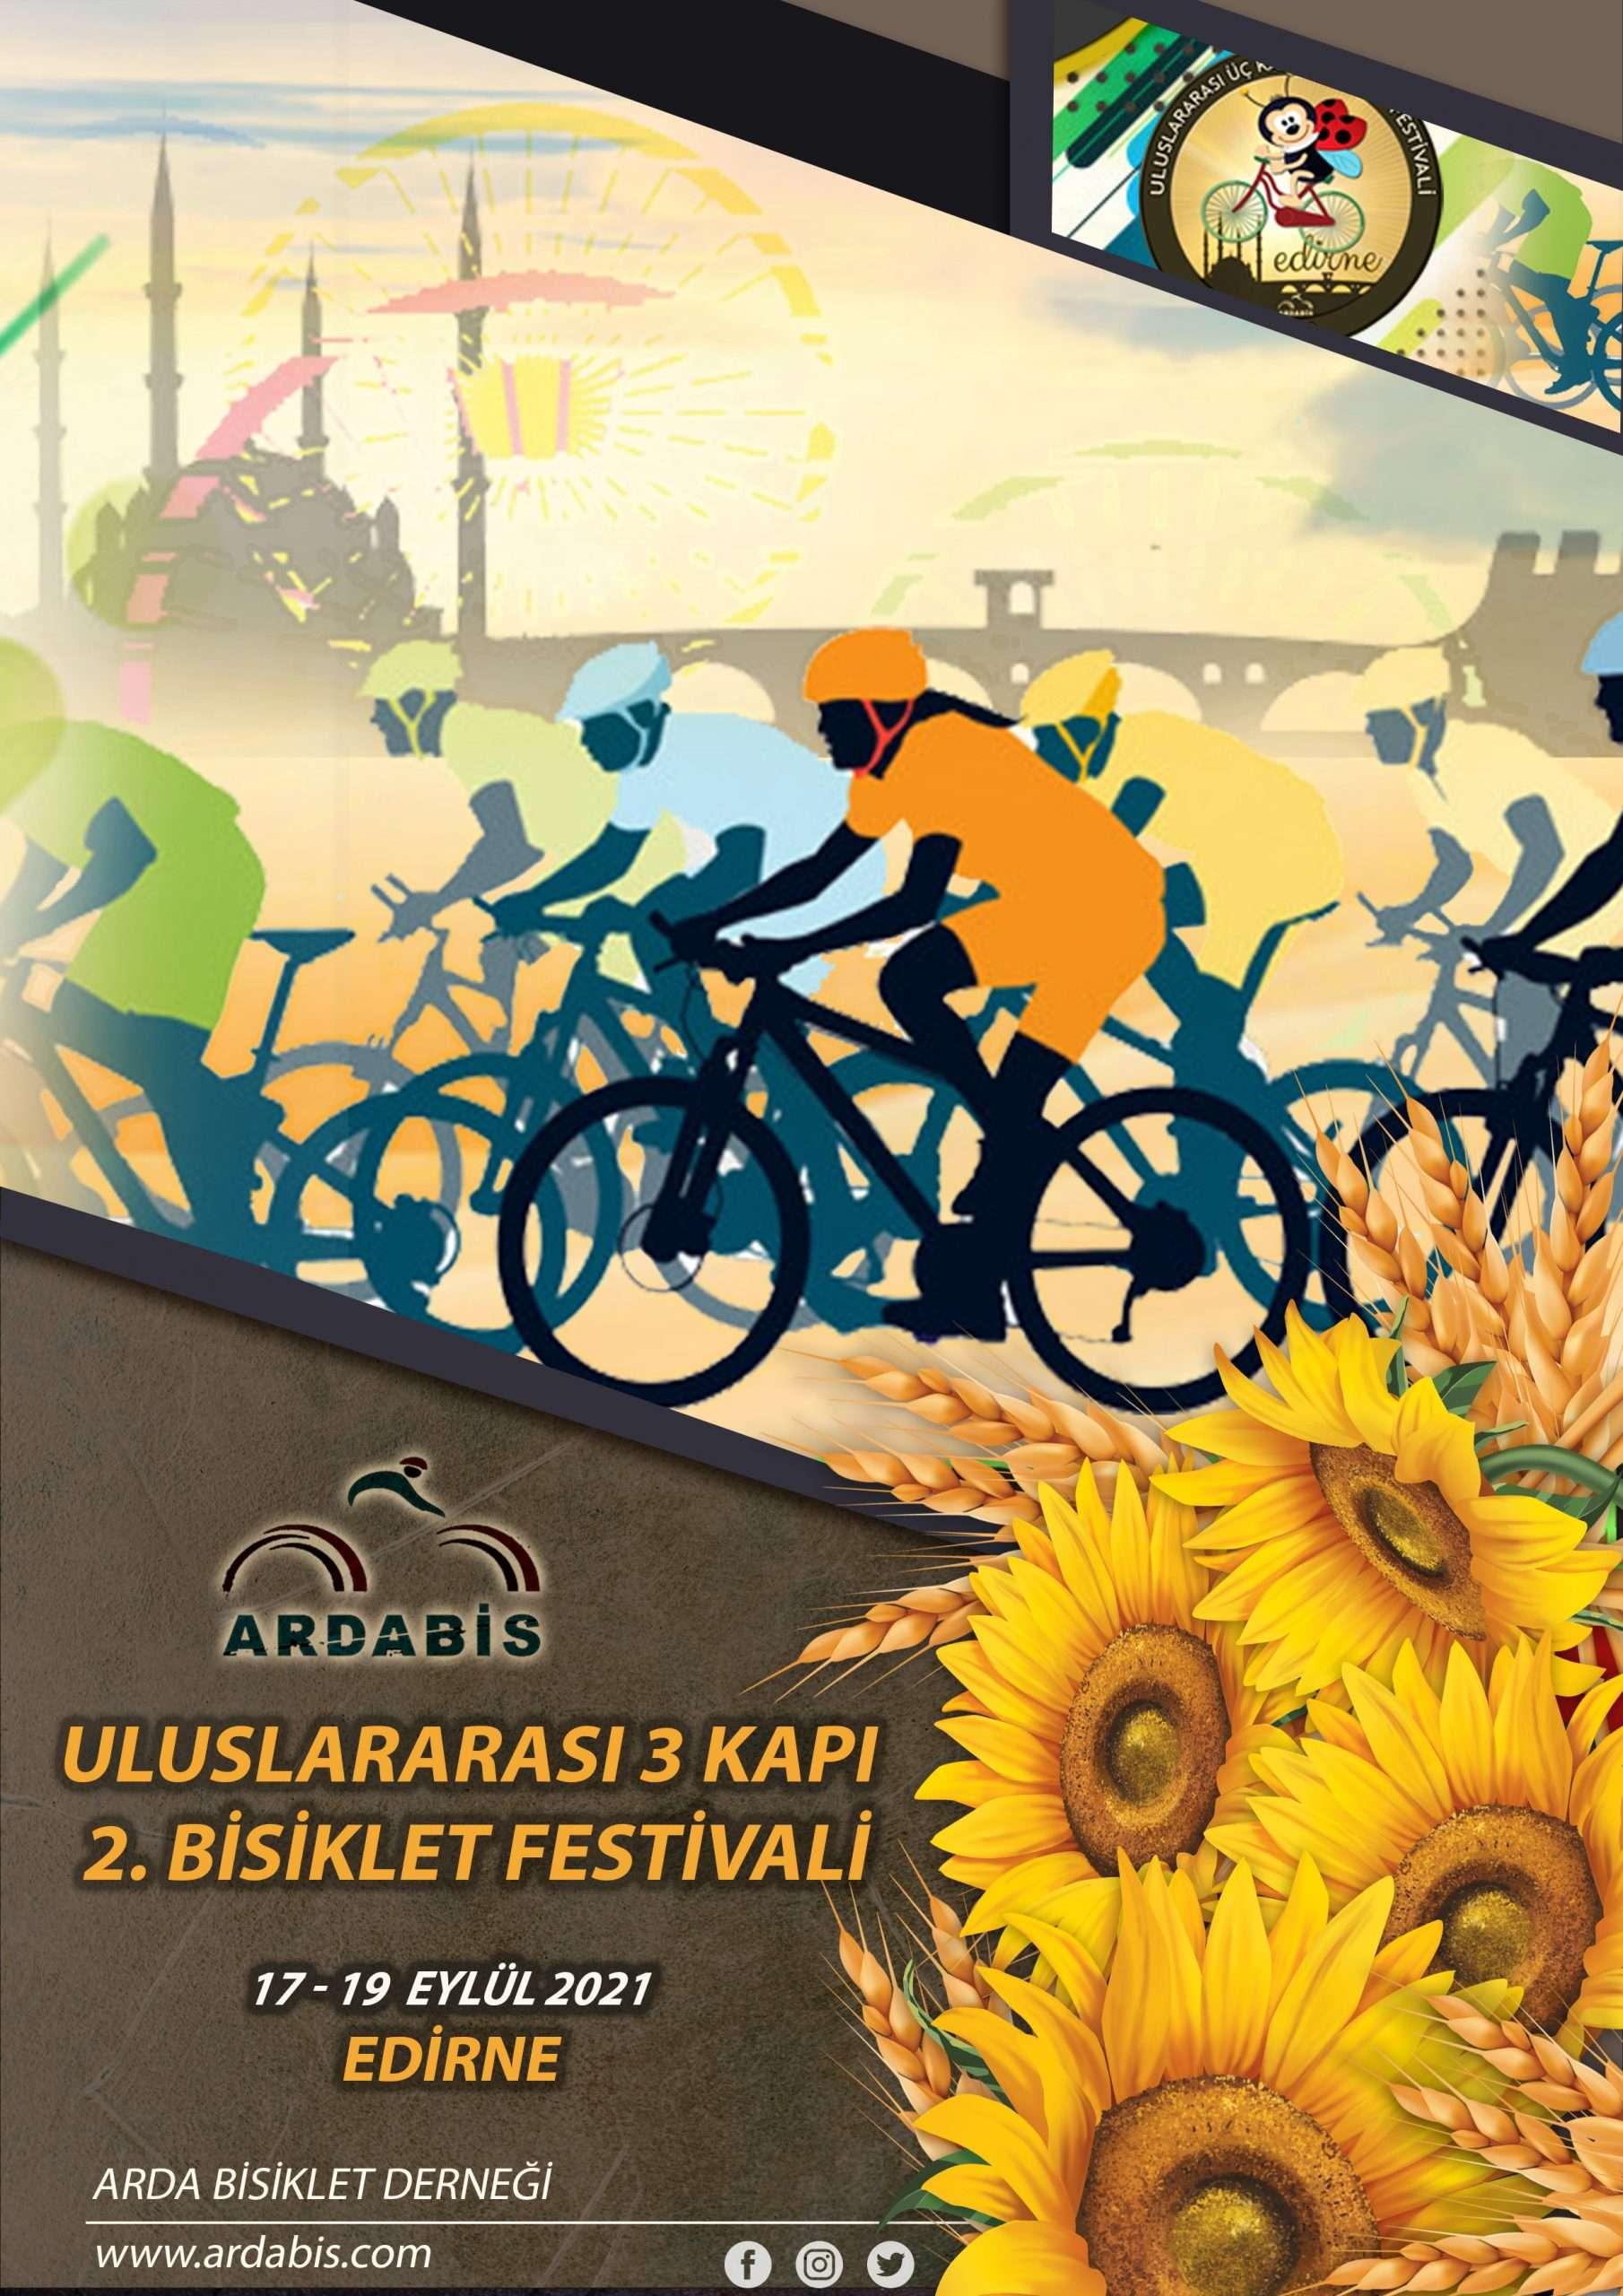 uluslararasi-3-kapi-bisiklet-festivali-1154